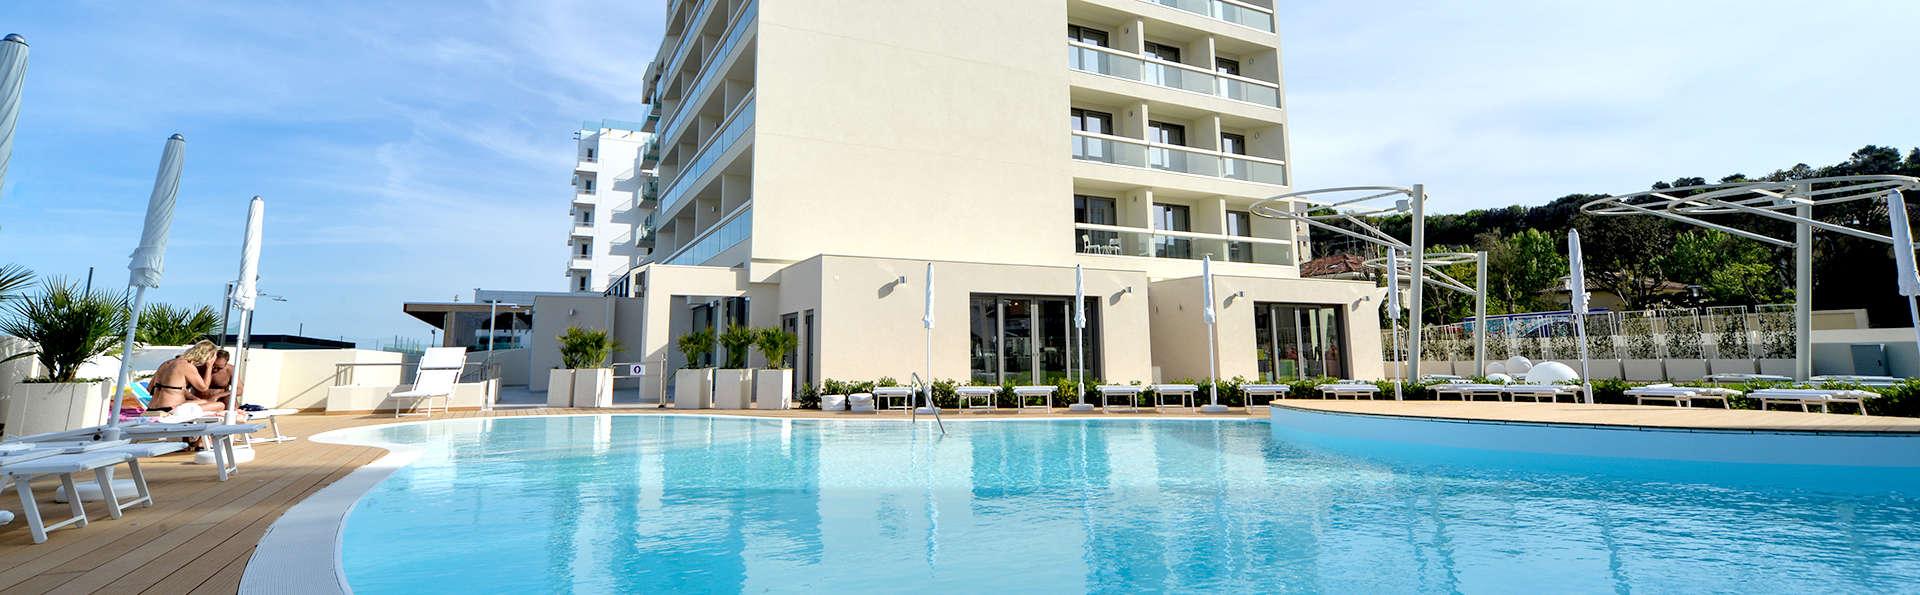 Nautilus Family Hotel - Edit_Pool2.jpg